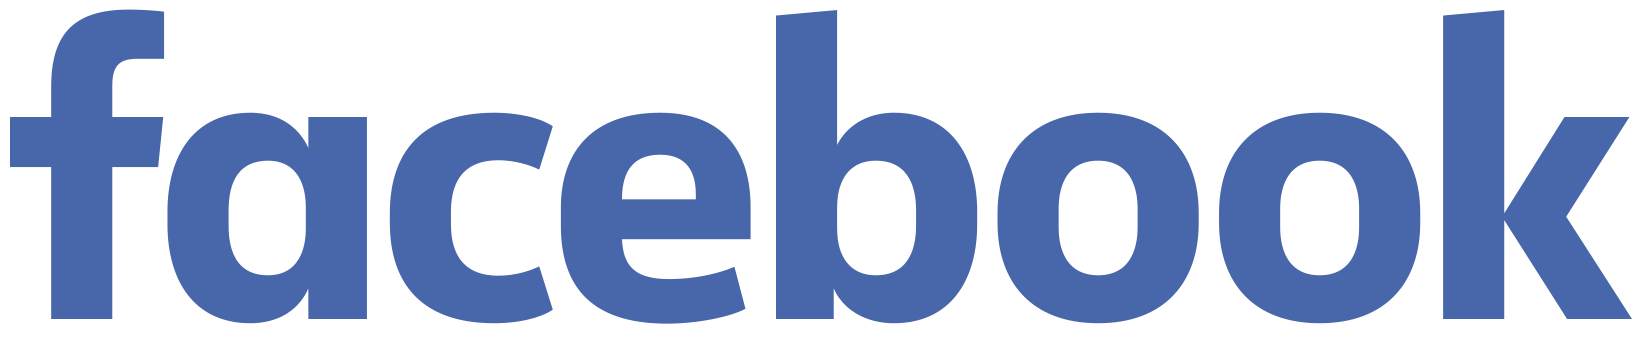 Facebook-06-2015-Blue